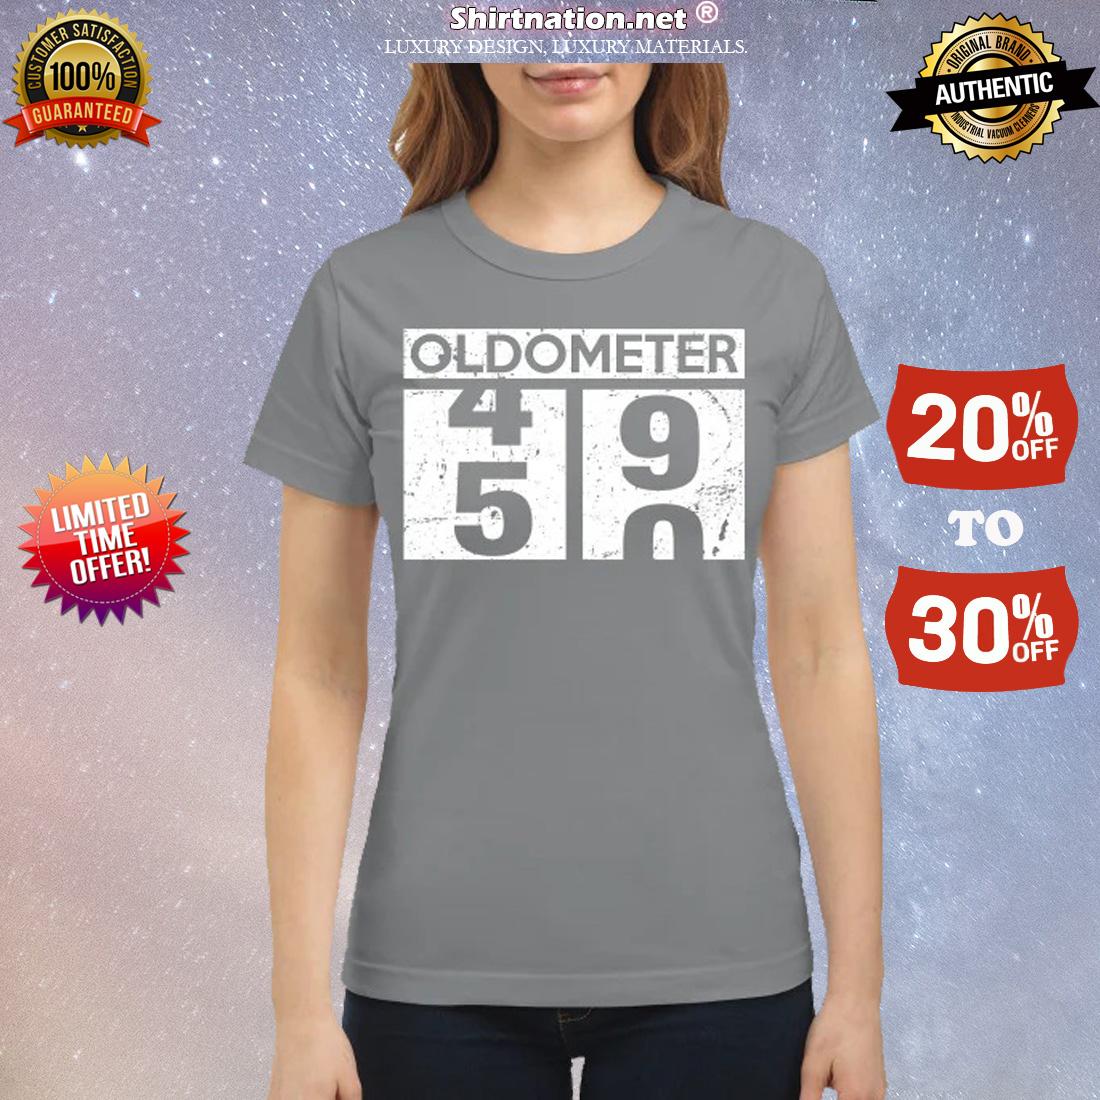 Oldometer 49 50 classic shirt